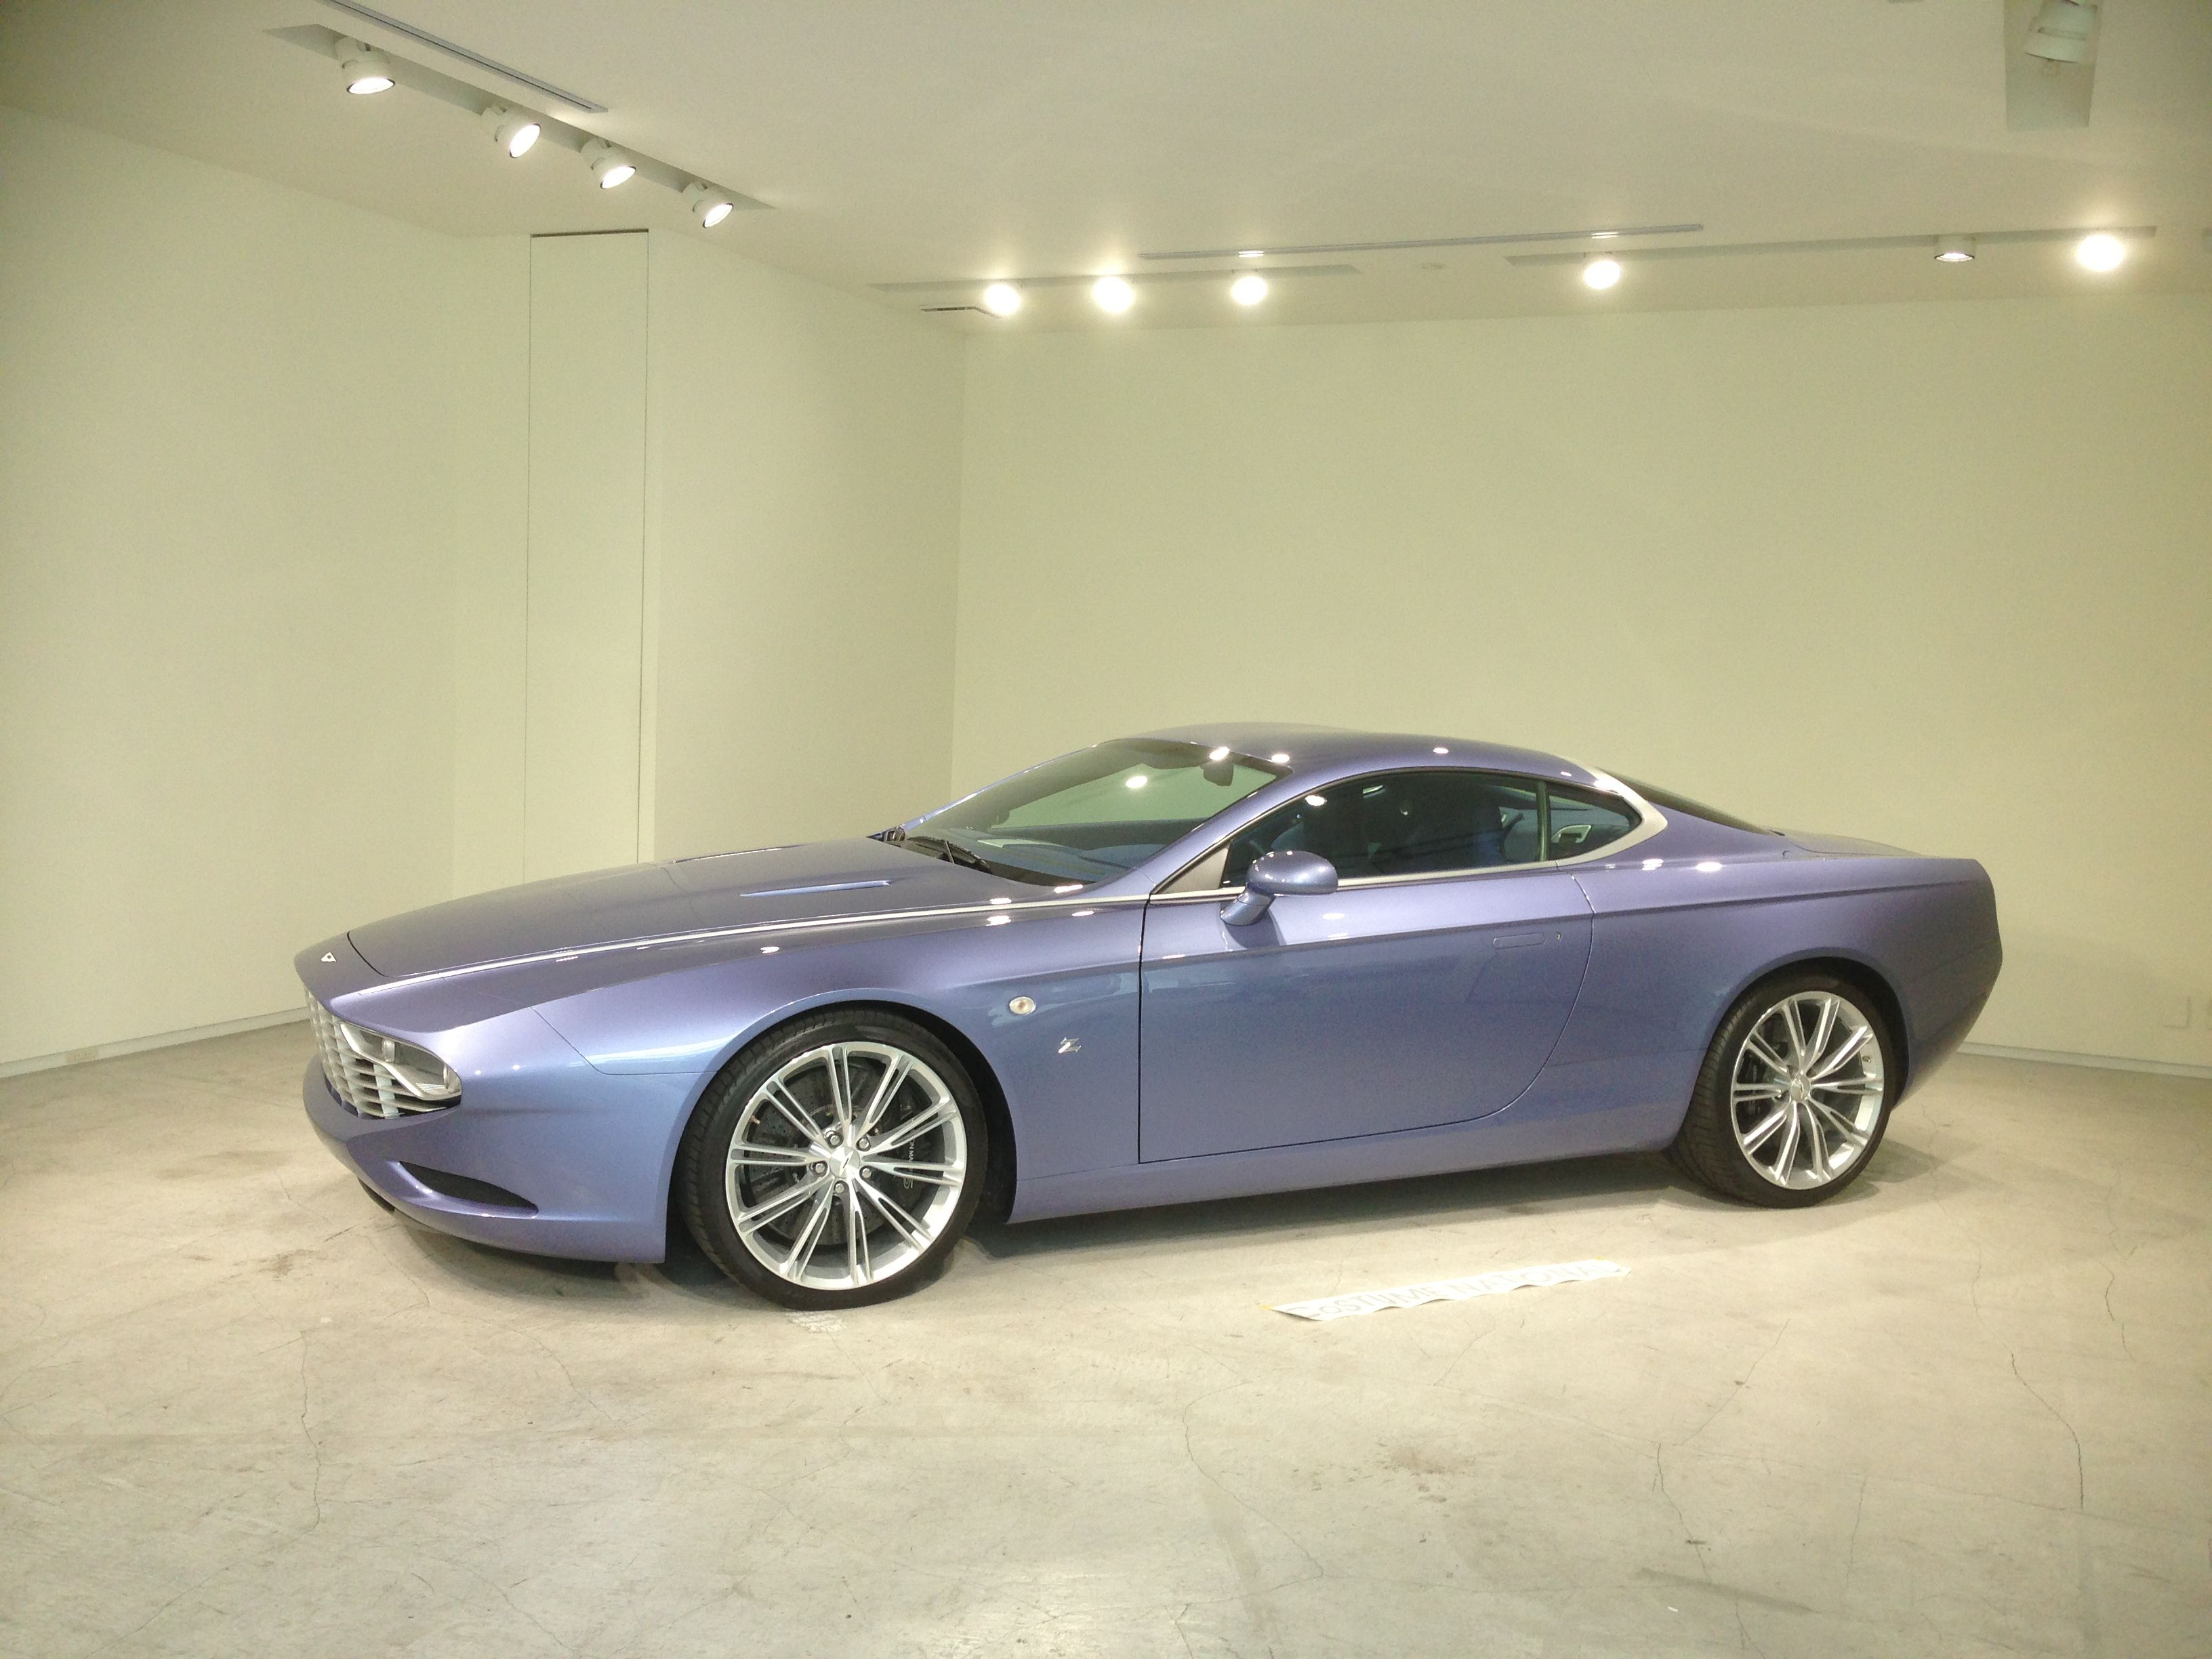 only one on the earth Aston Martin DBS Coupe ZAGATO CENTENNIAL